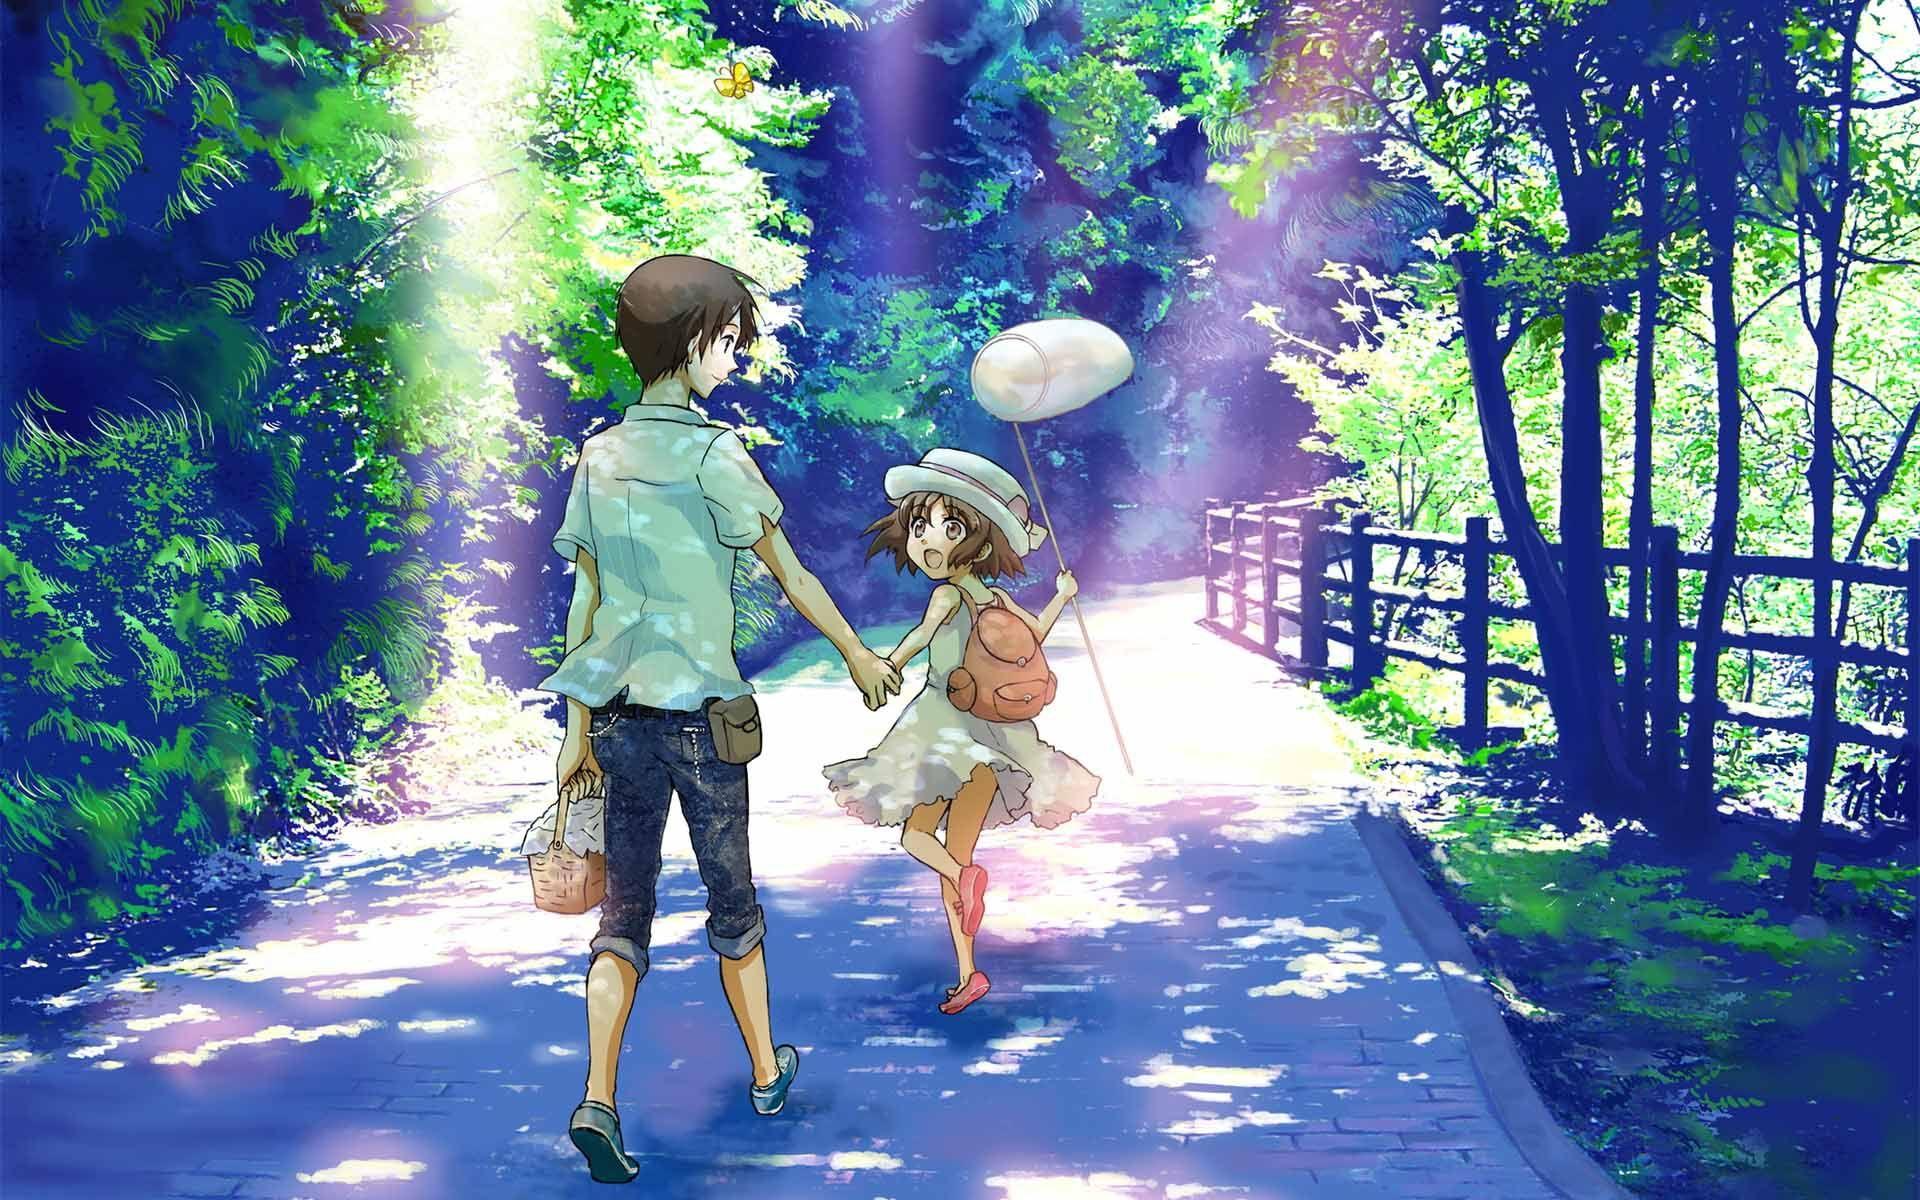 Pin by Pawwz パウラさん on Fav Songs! Anime scenery, Anime